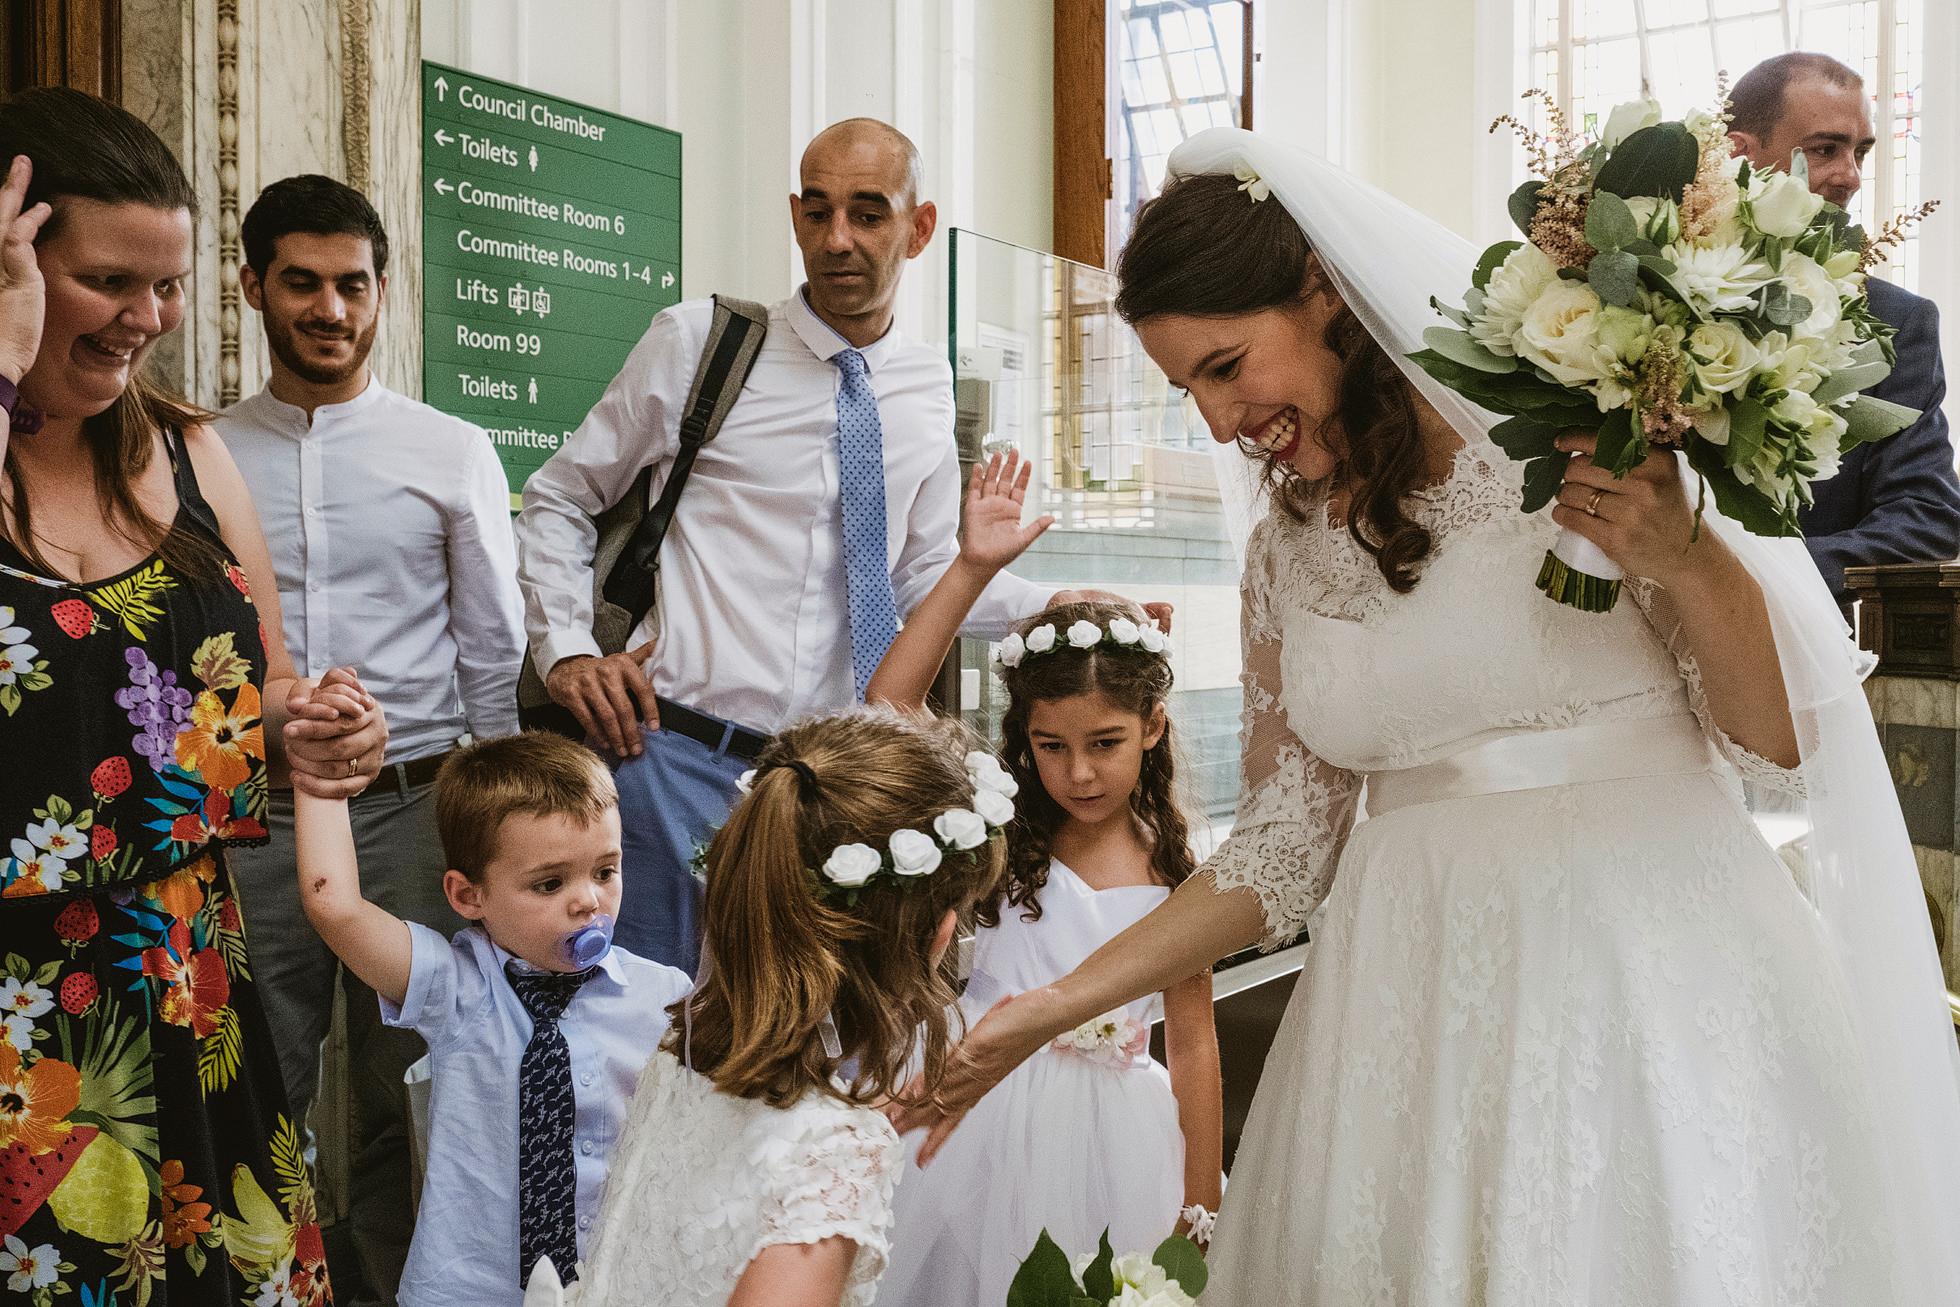 Wedding guests at Islington Town Hall